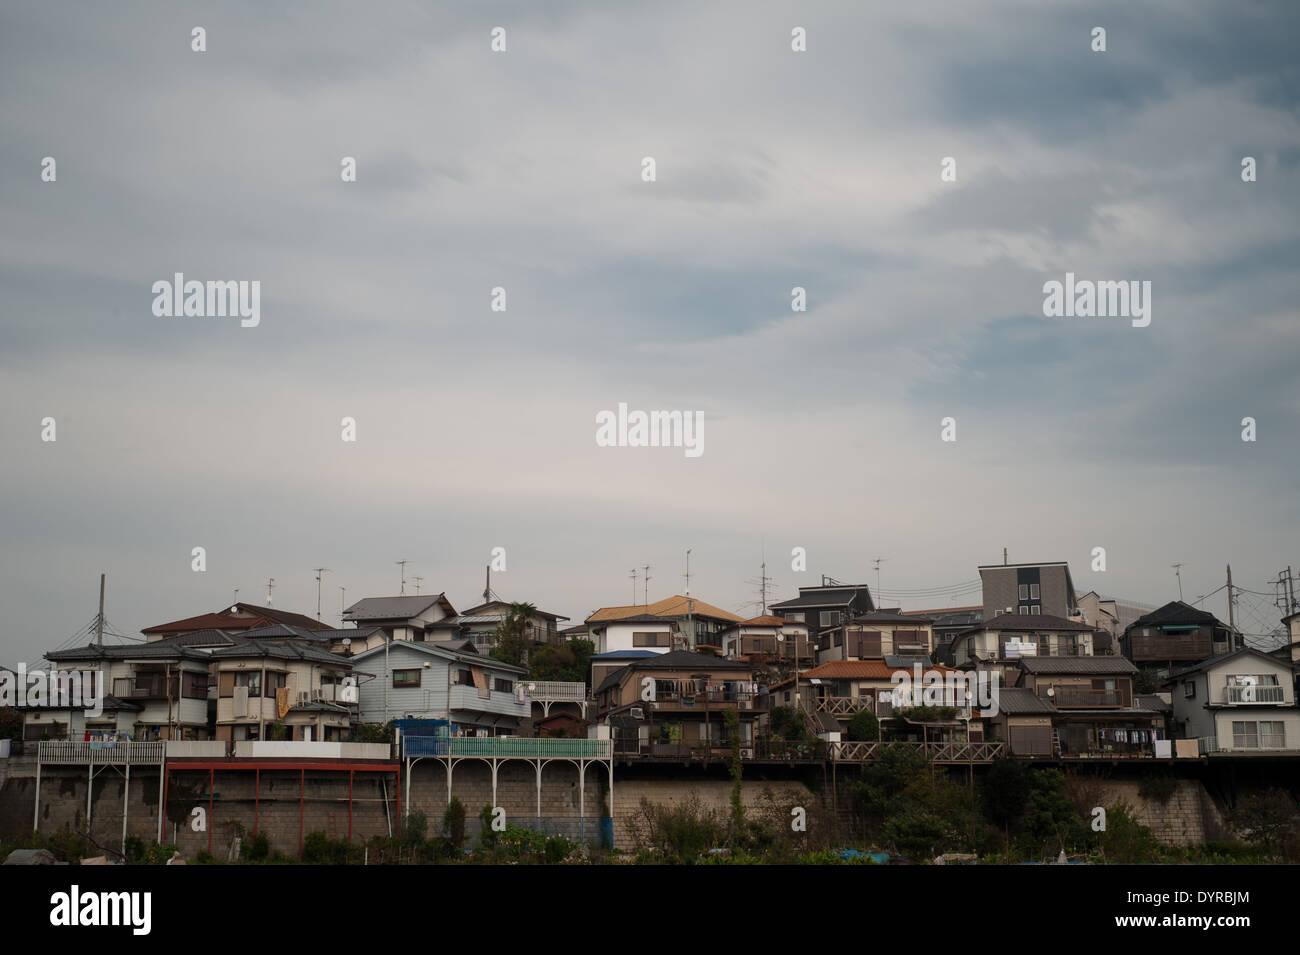 Houses In Yamato, Kanagawa Prefecture, Japan - Stock Image